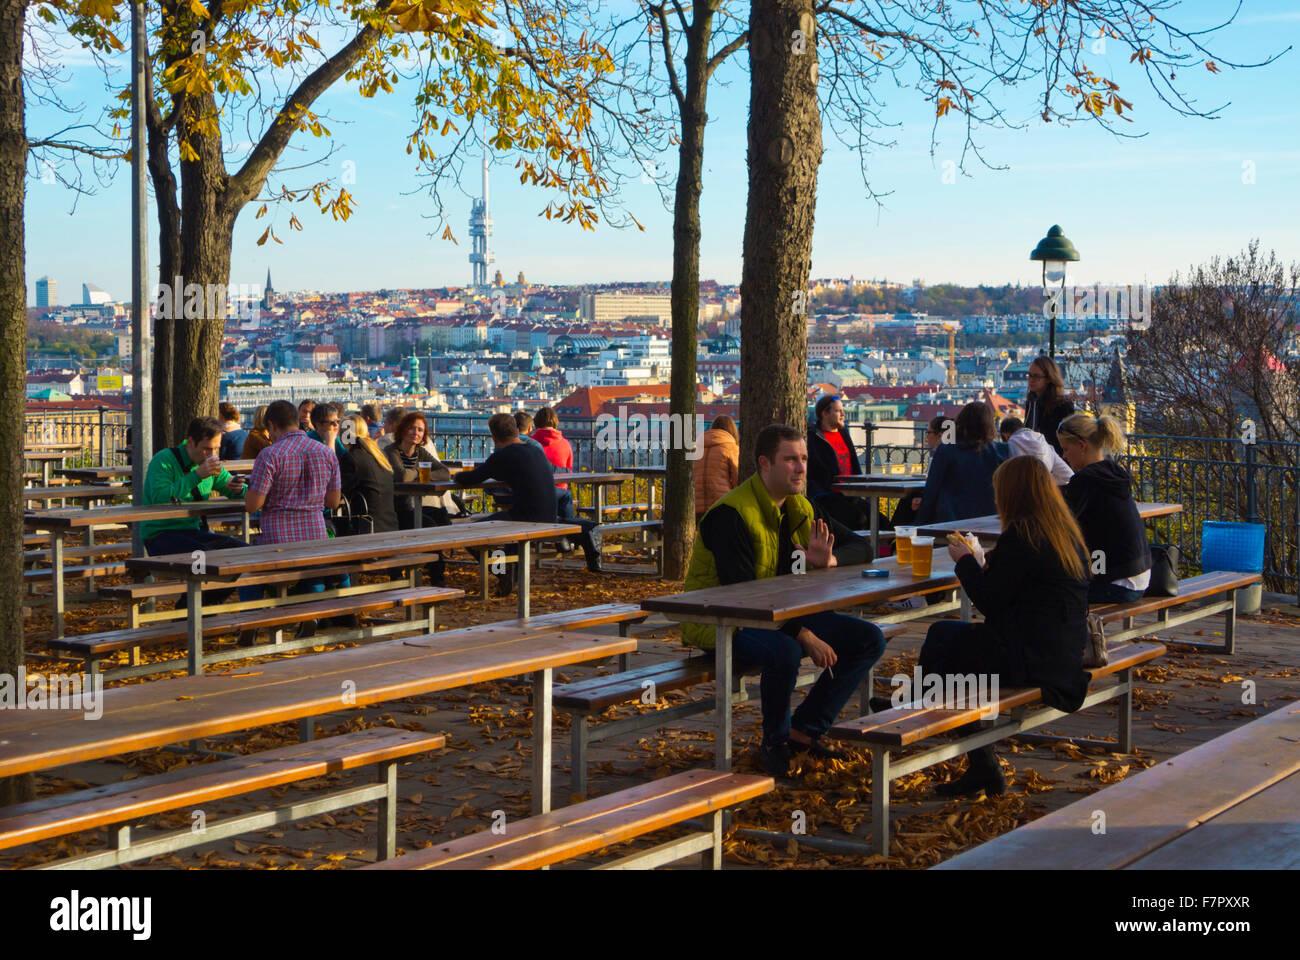 Beer garden, Letenske sady, Letna Park, Prague, Czech Republic - Stock Image